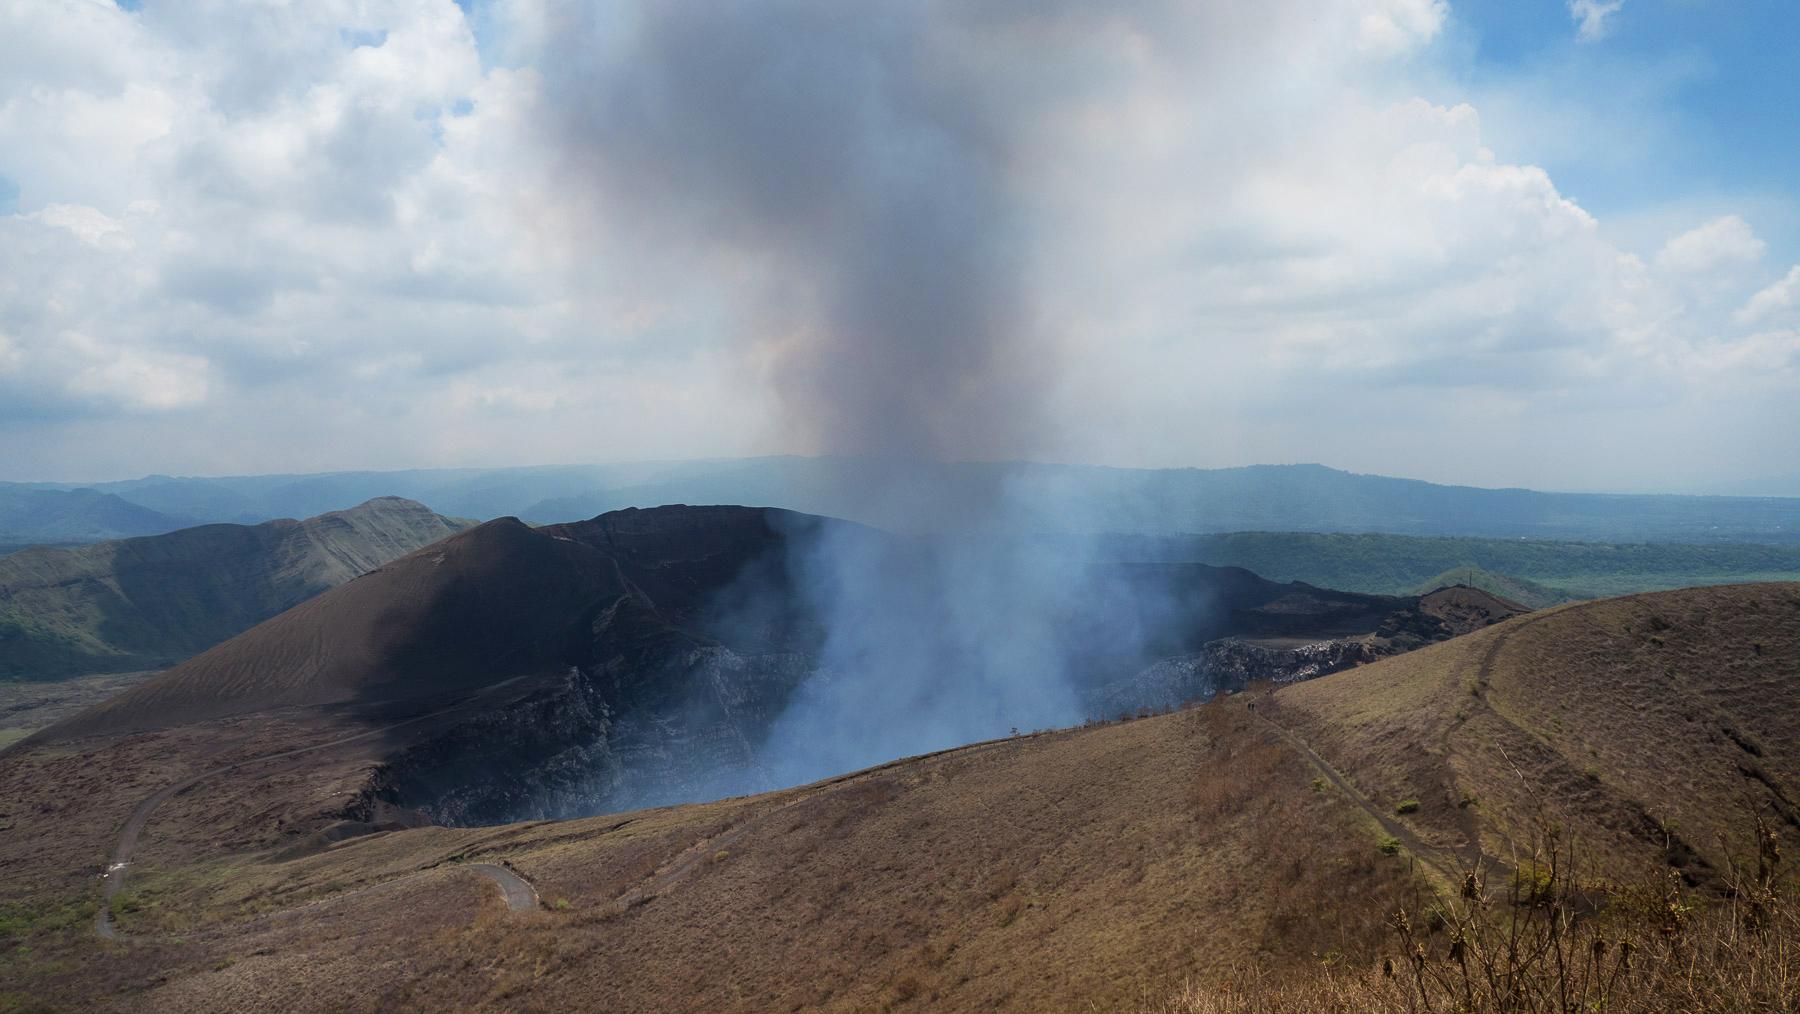 Ein absolutes Highlight: der sehr aktive Vulkan Masaya